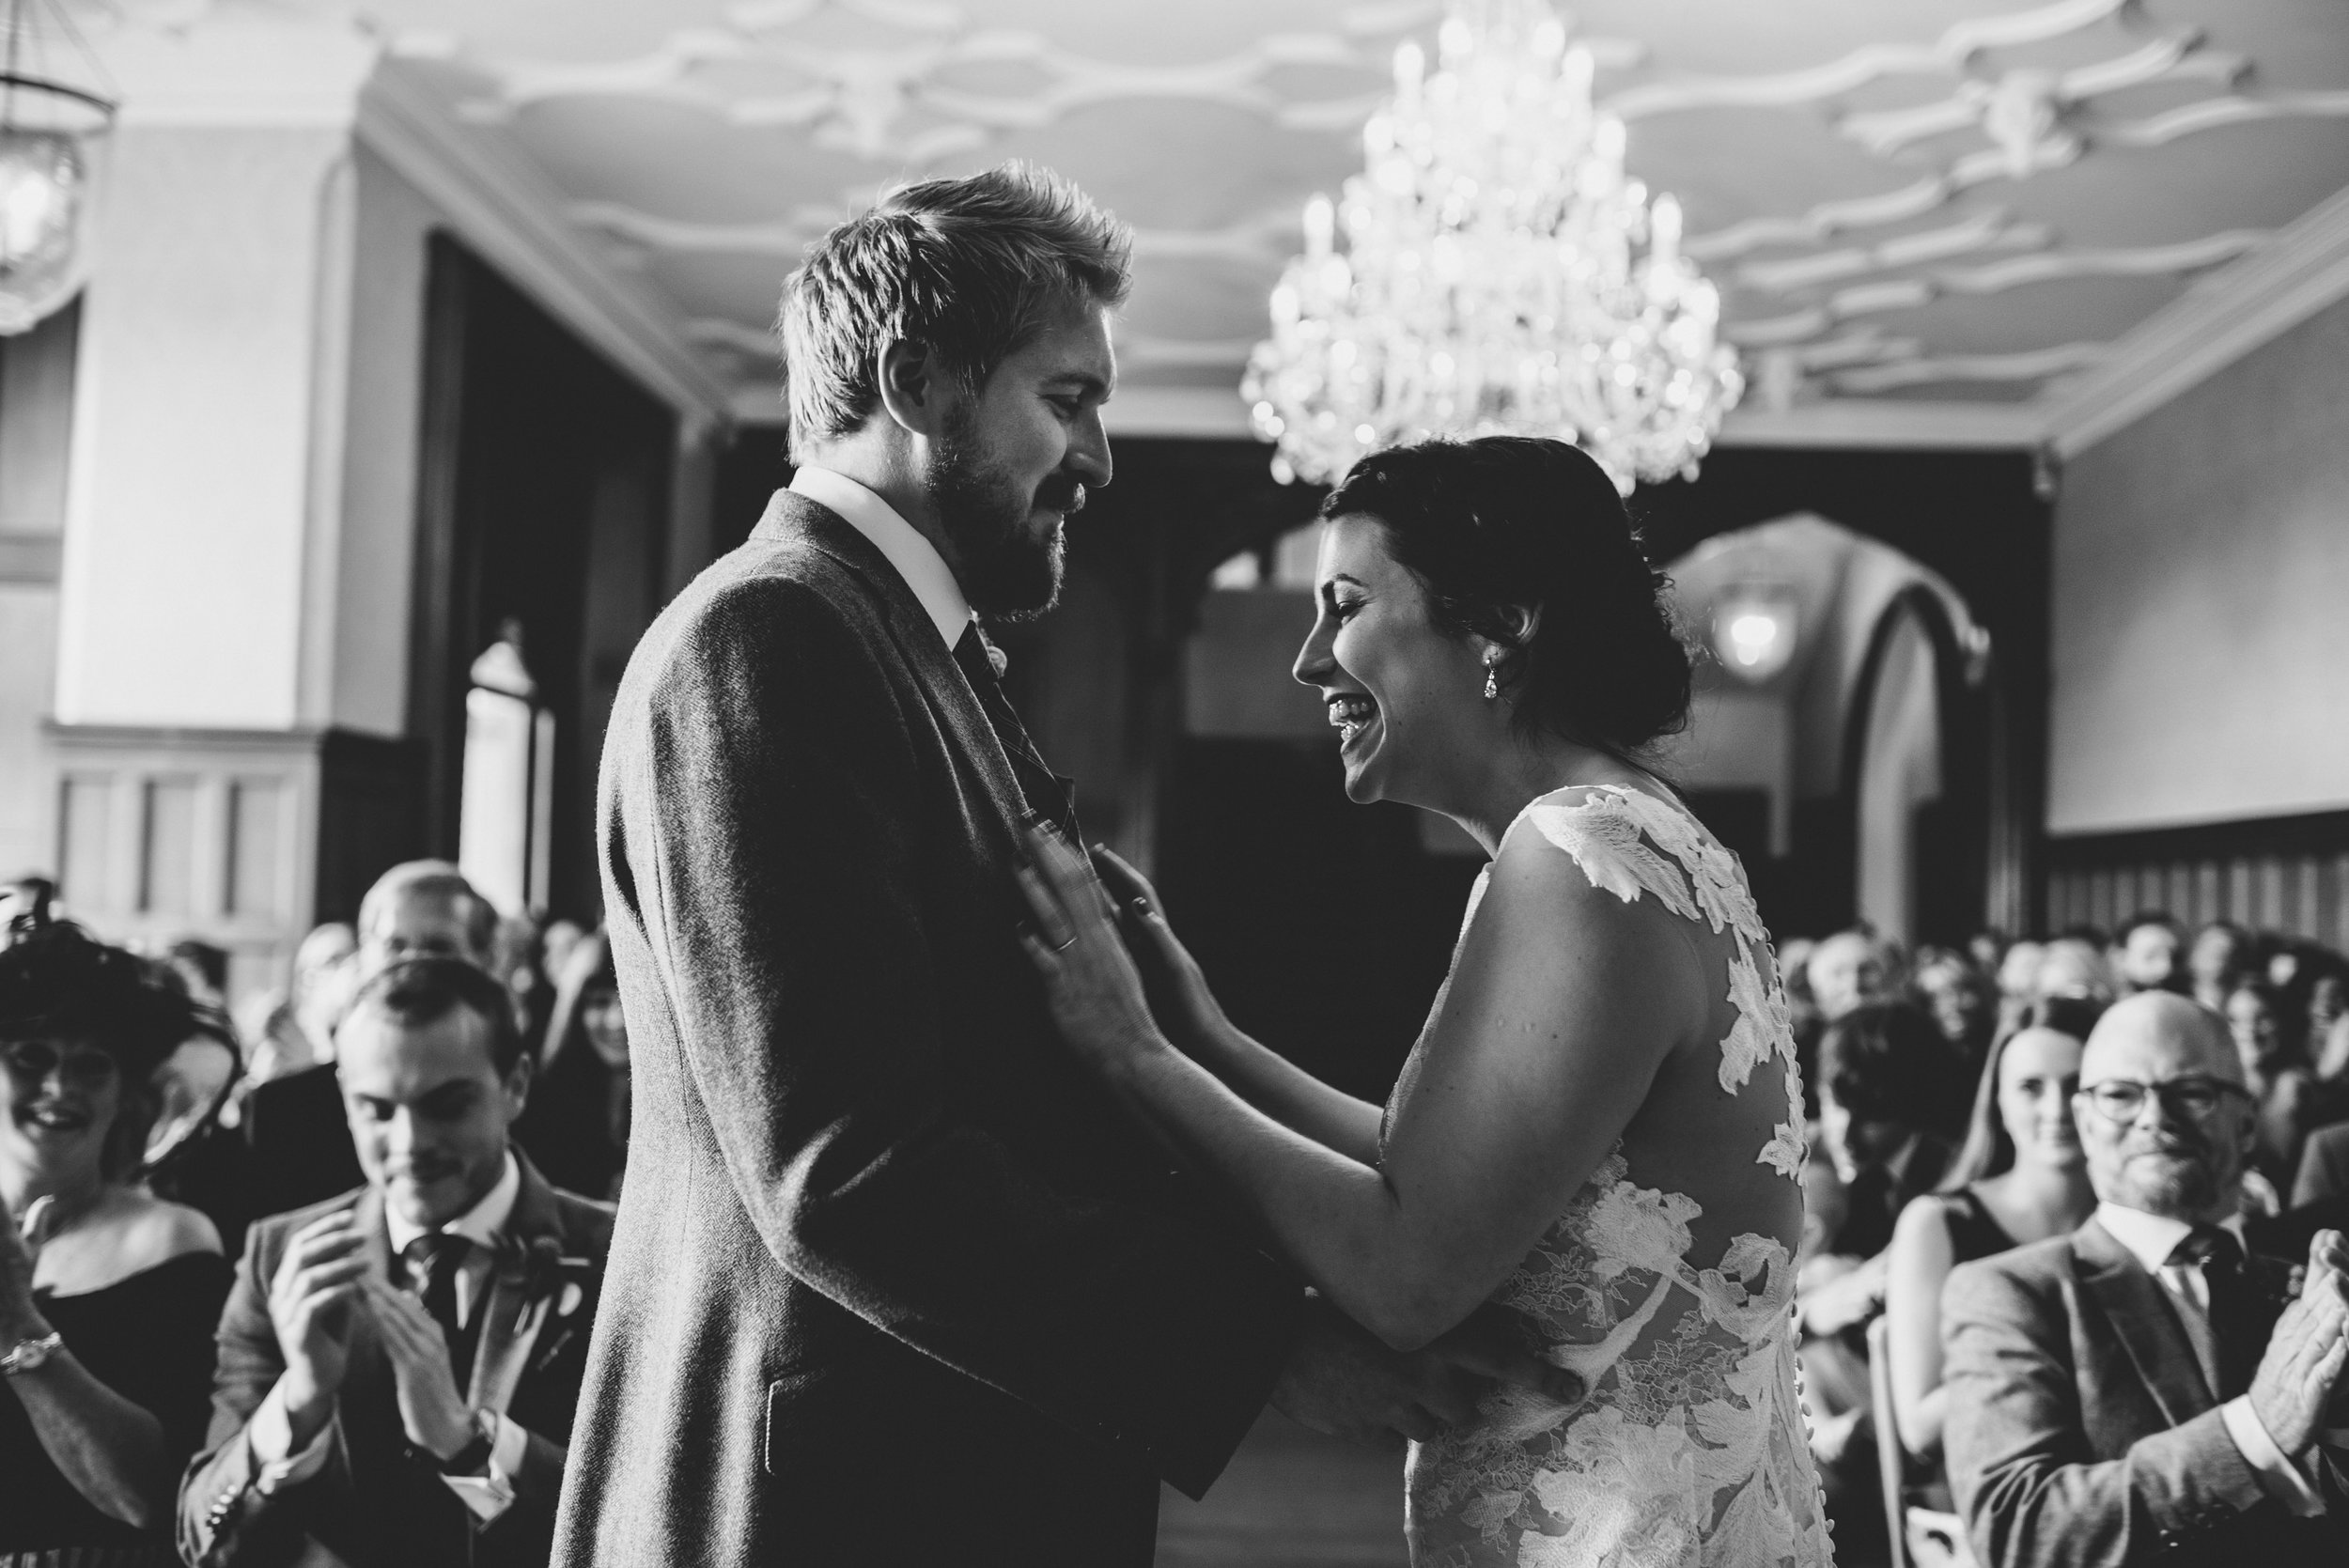 0201-LISA-DEVINE-PHOTOGRAPHY-ALTERNATIVE-WEDDING-PHOTOGRAPHY-SCOTLAND-DESTINATION-WEDDINGS-GLASGOW-WEDDINGS-COOL-WEDDINGS-STYLISH-WEDDINGS.JPG